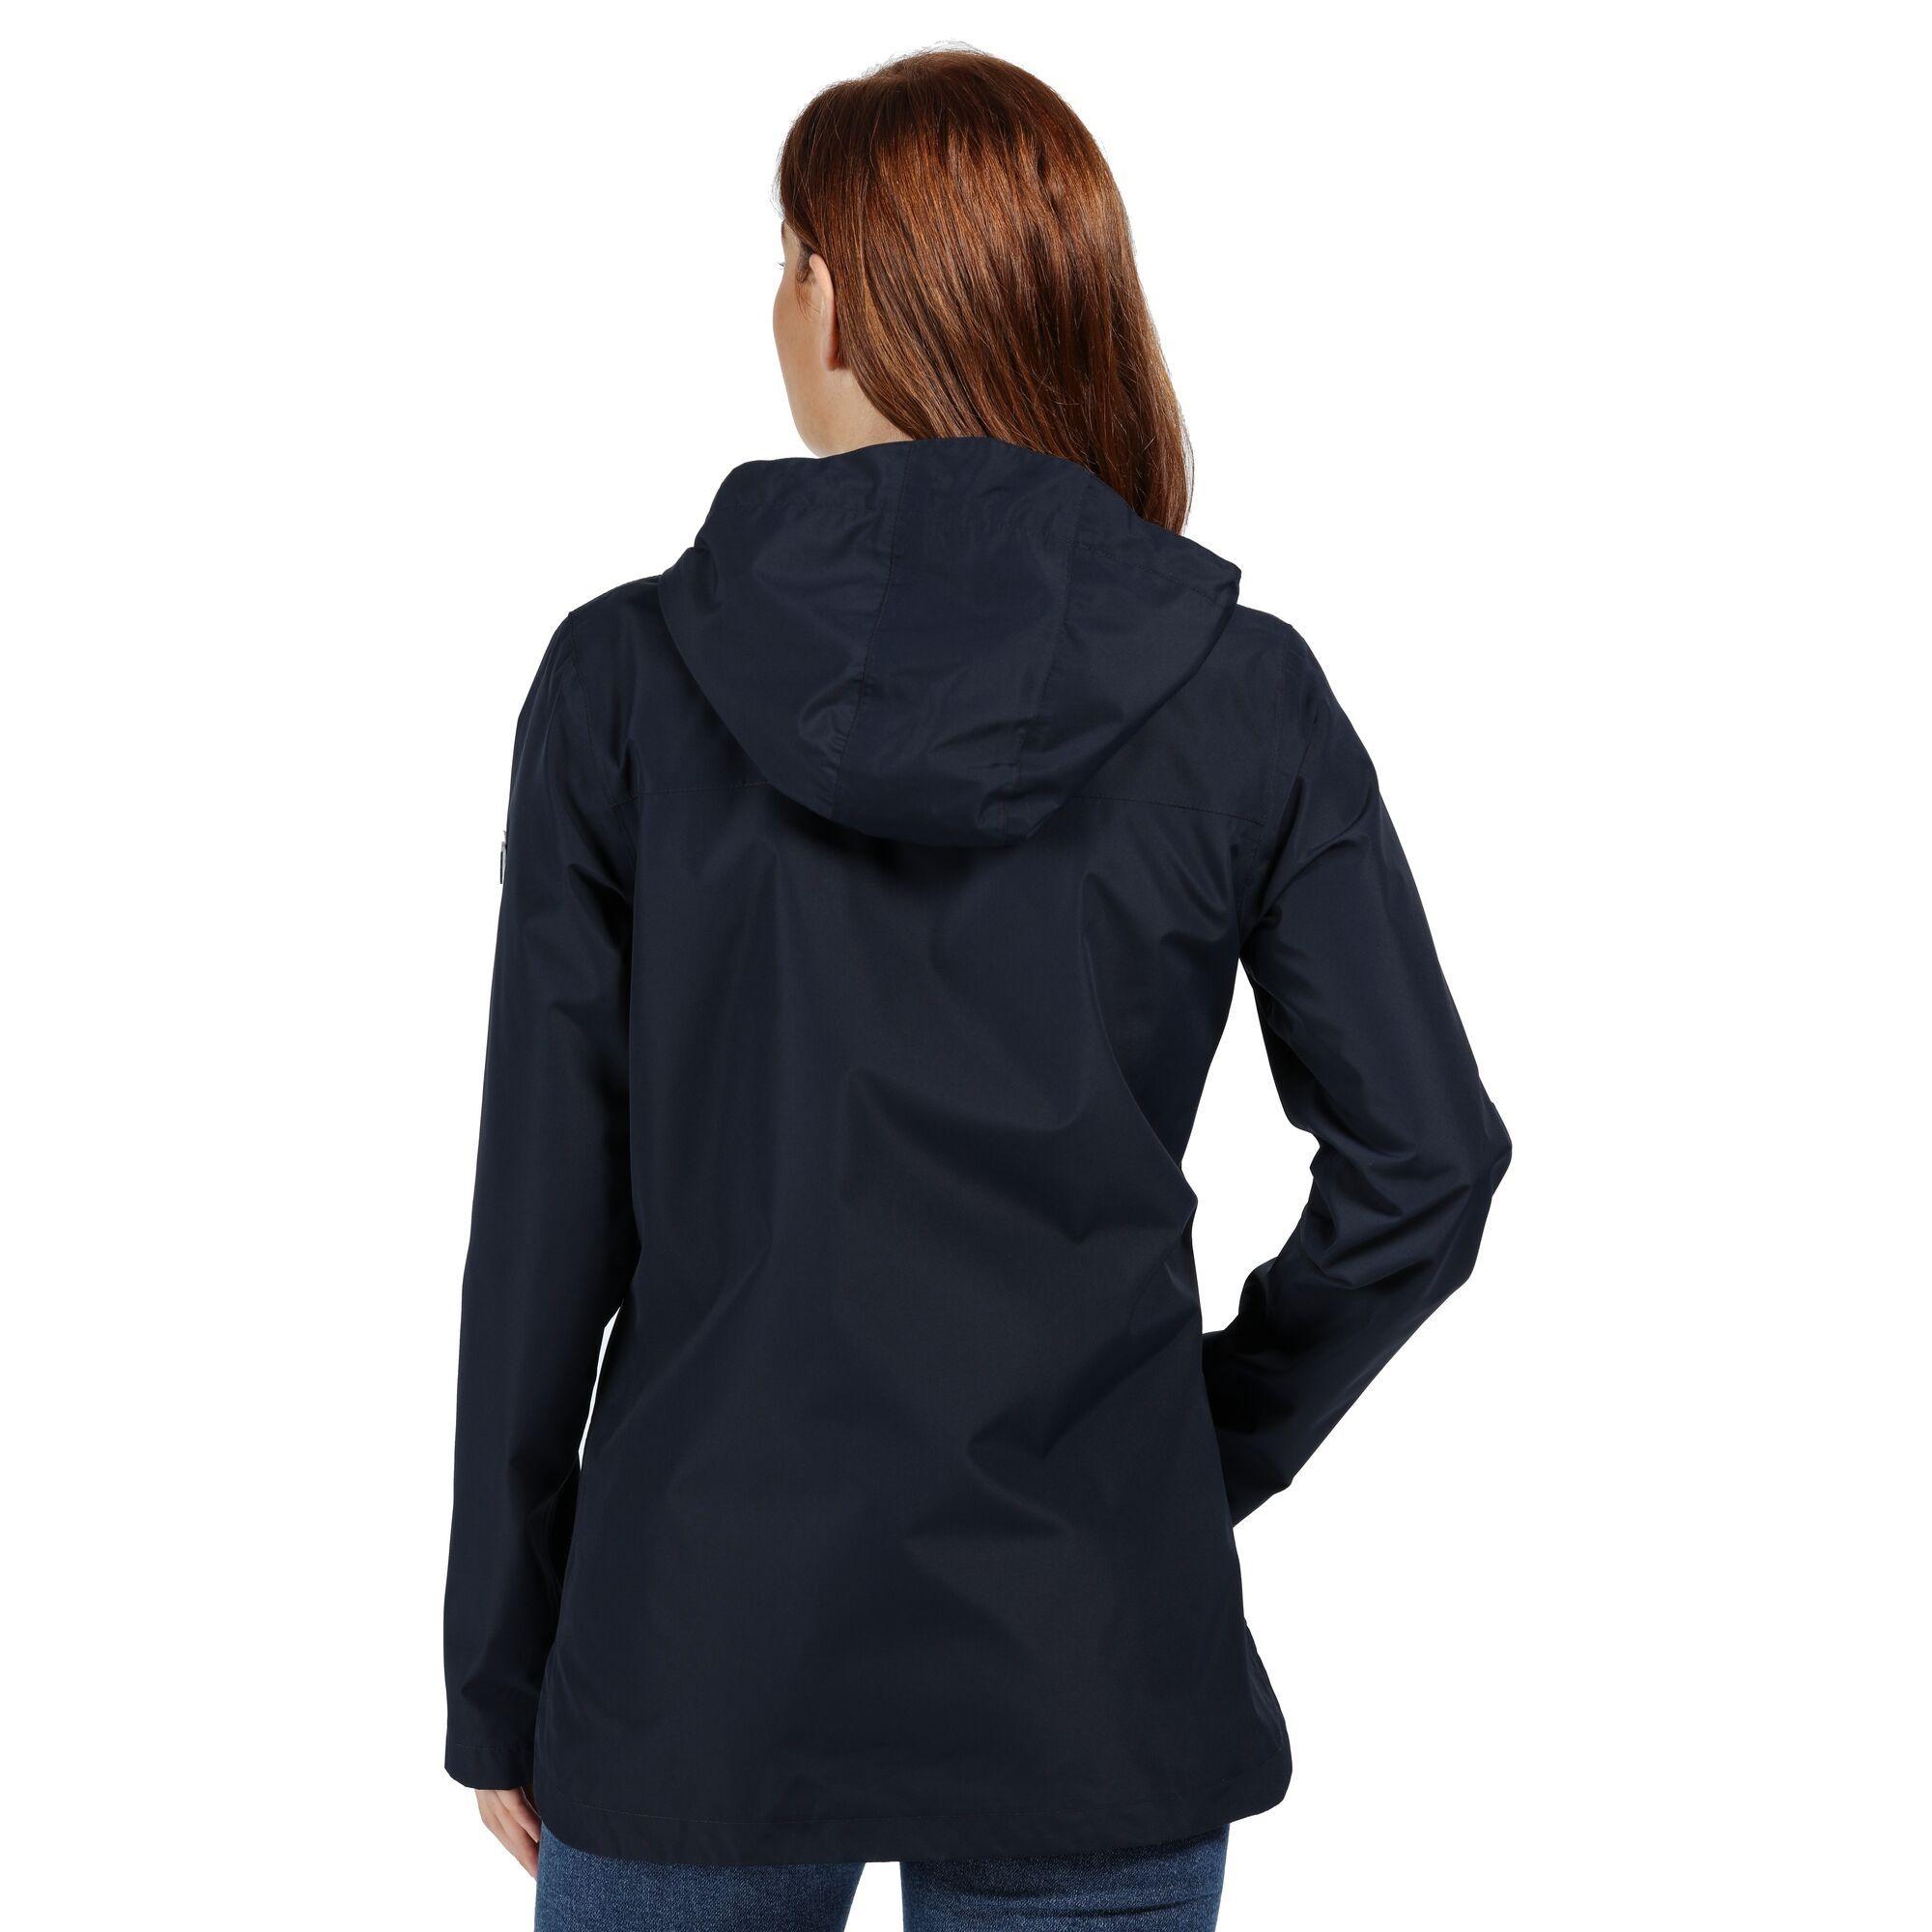 Regatta Womens/Ladies Bertille Waterproof Jacket